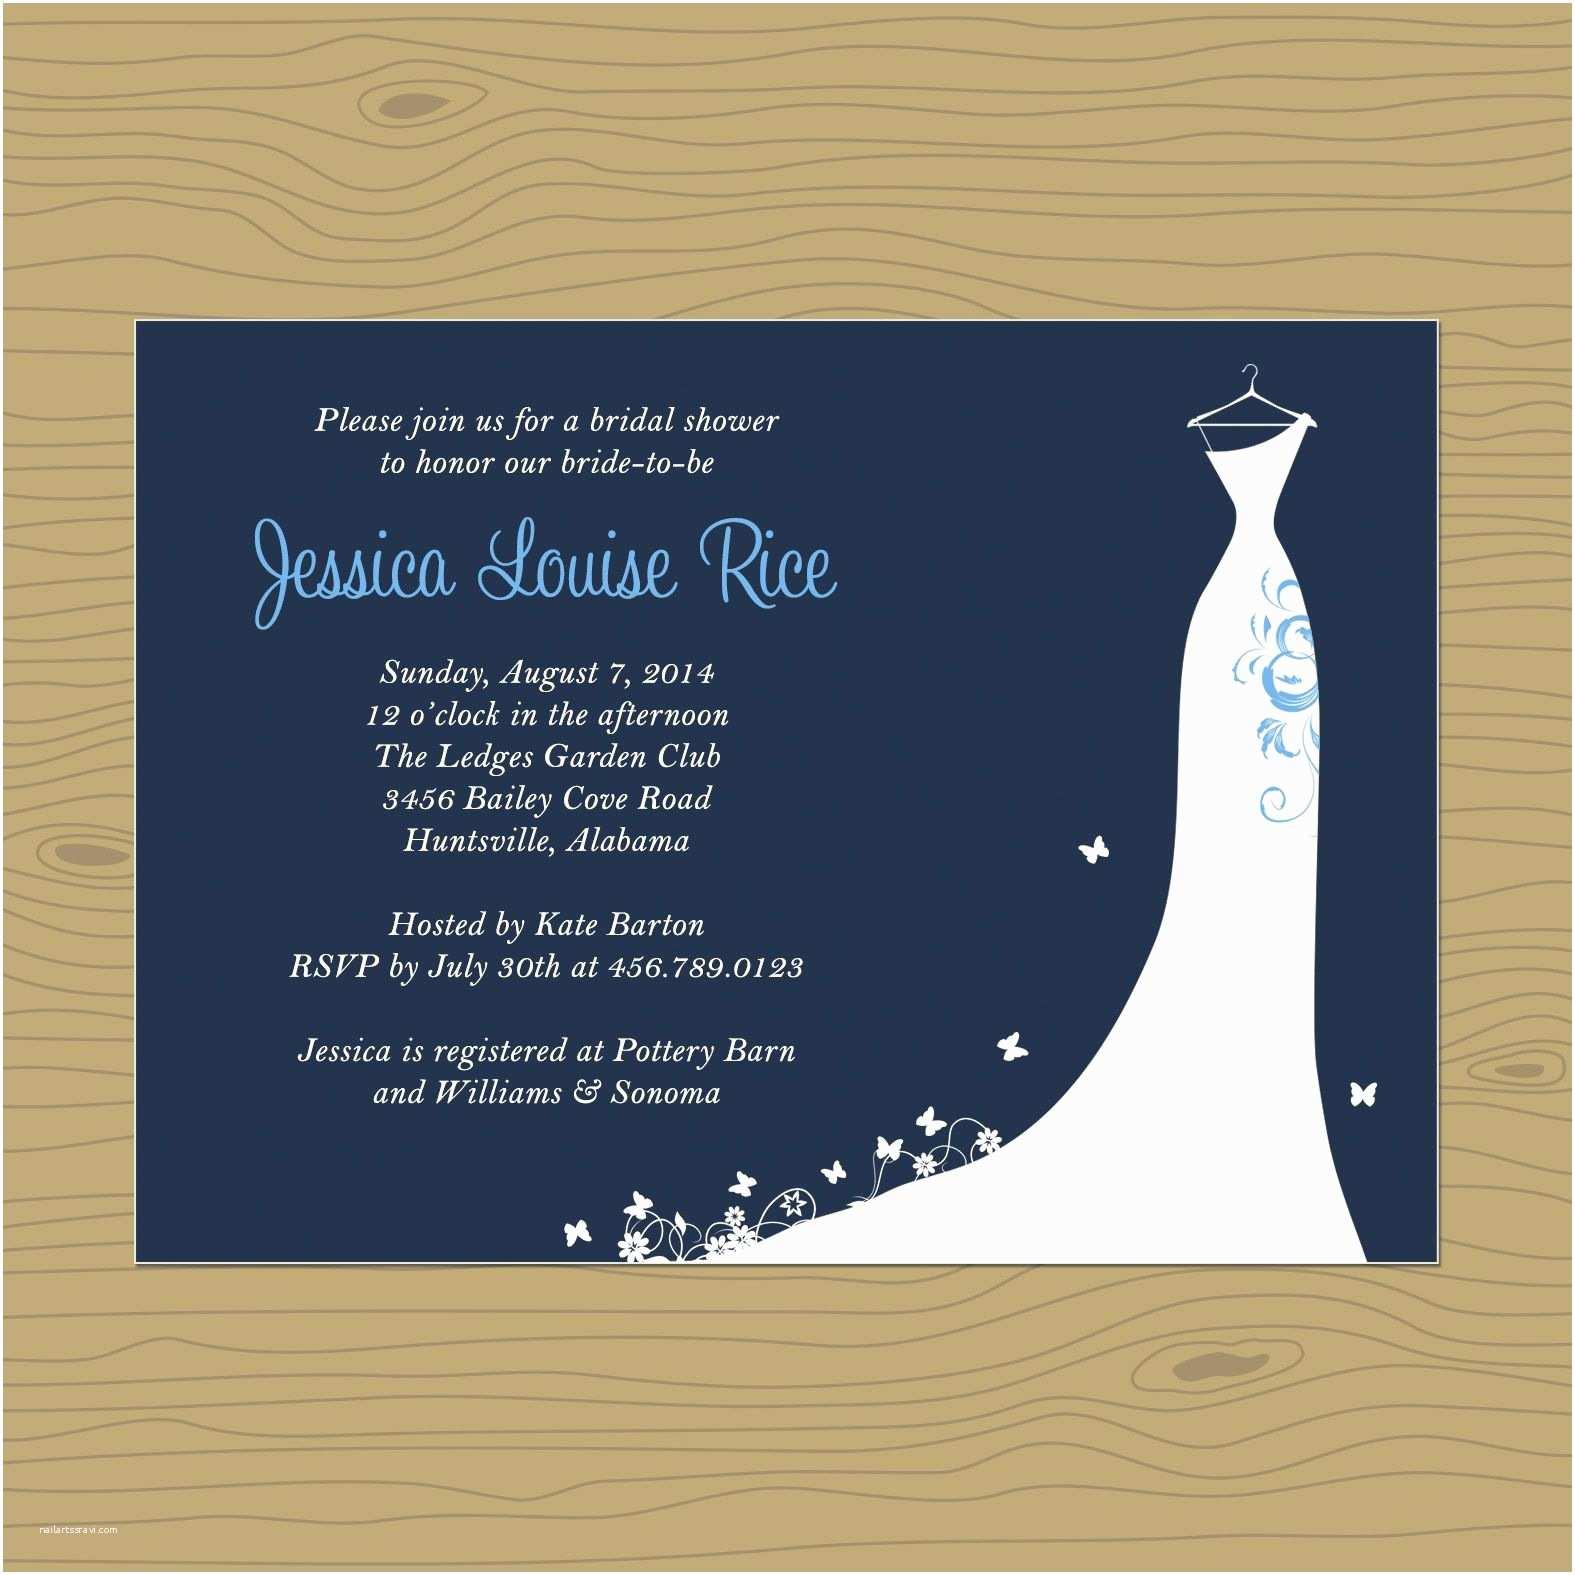 Vista Prints Wedding Invitations Vista Print Bridal Shower Invites Engagement Party